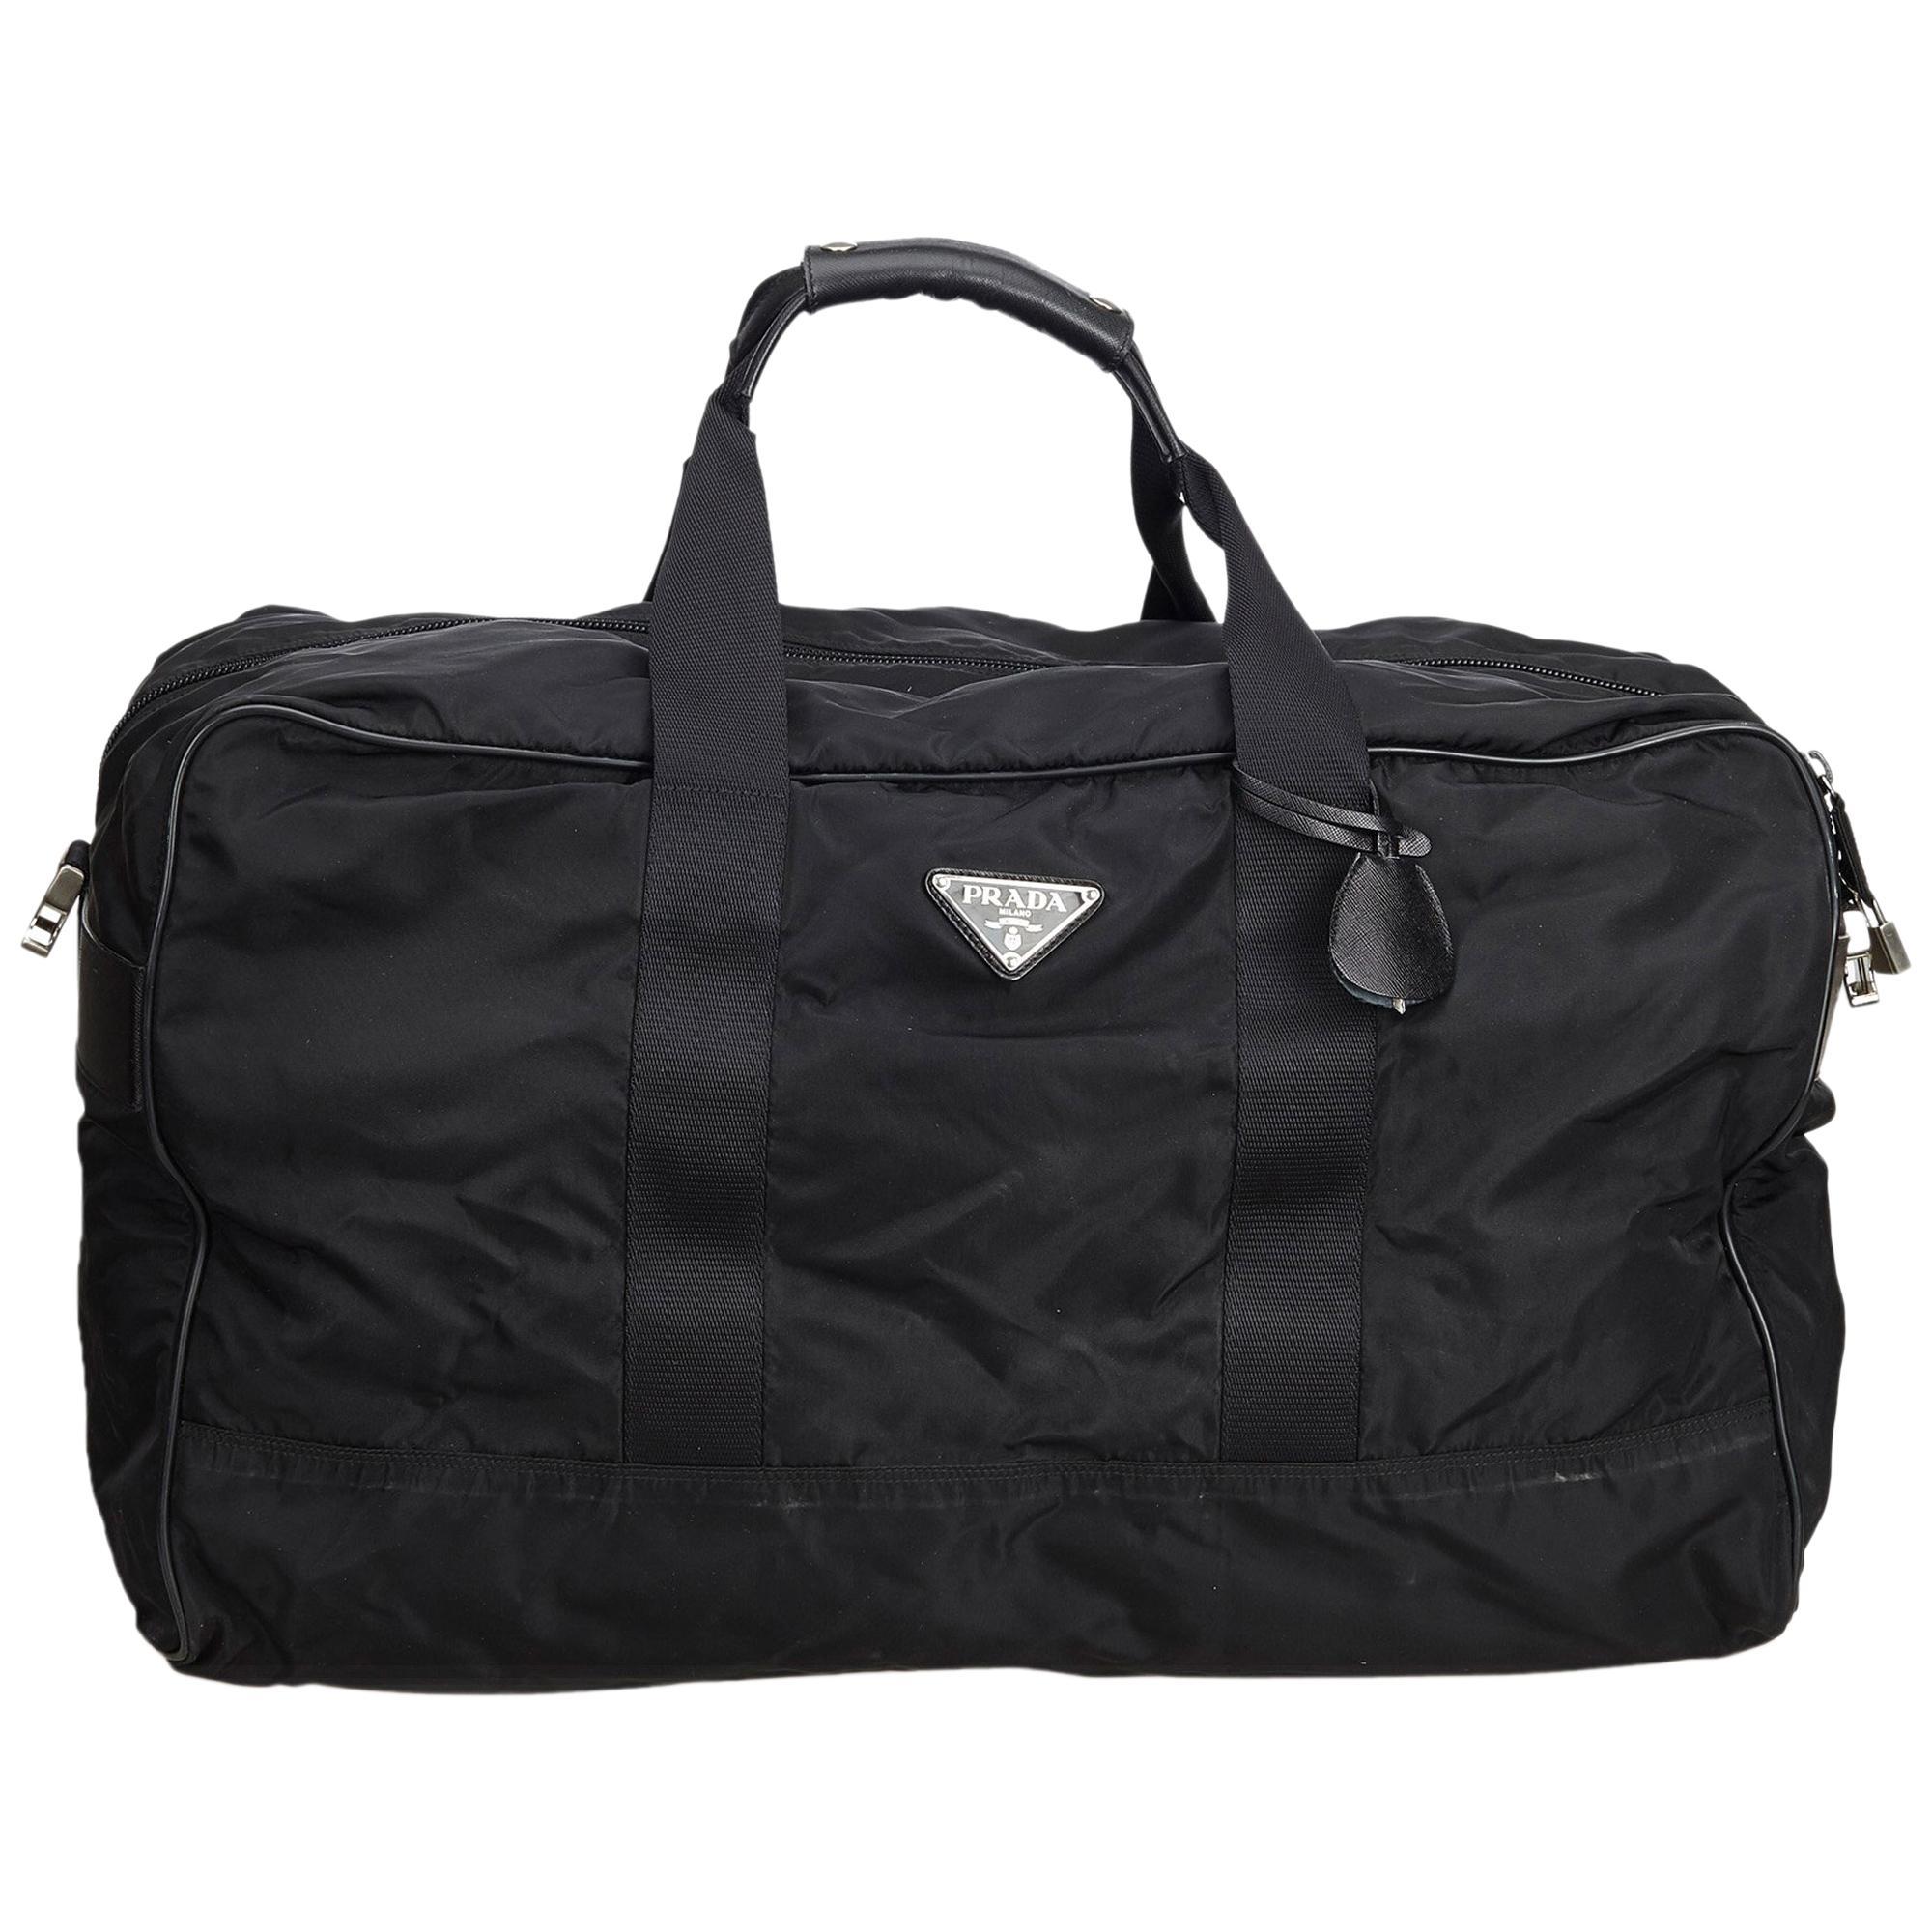 0e0928de75fe Prada Black Nylon Travel Bag at 1stdibs